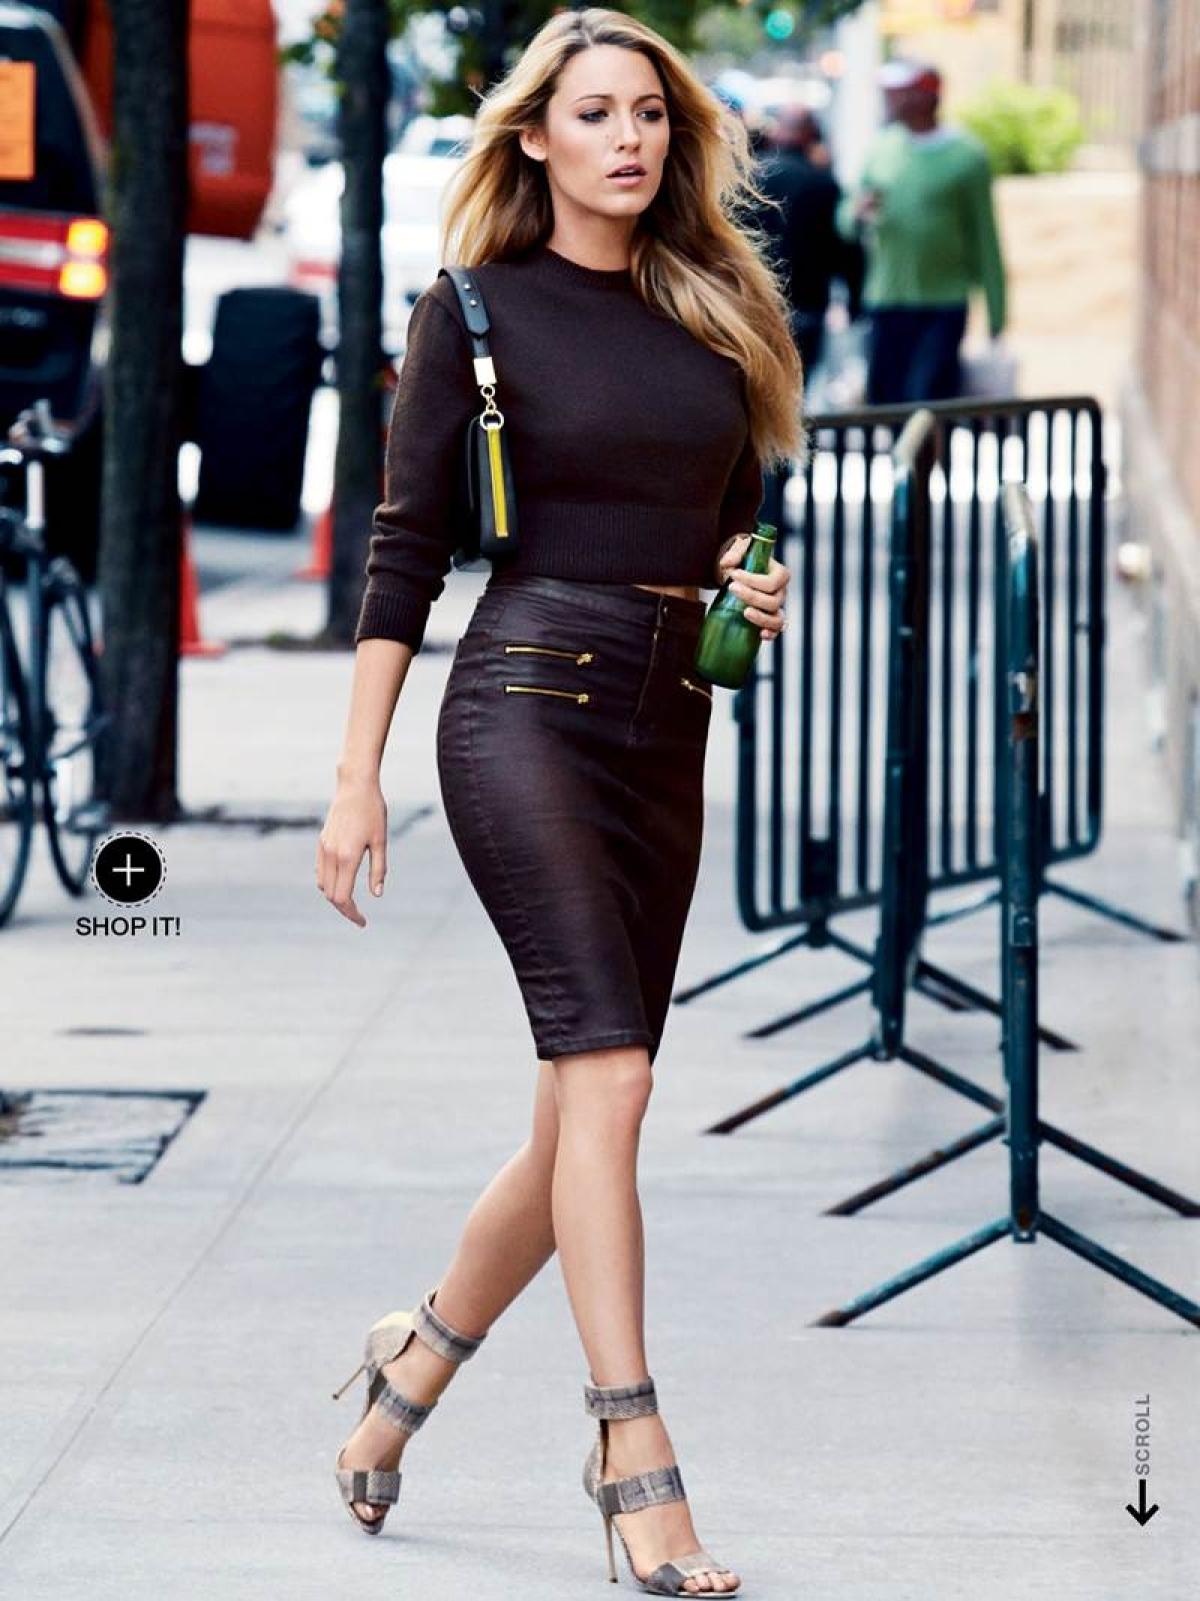 Walk like a pro, actress Blake Lively style